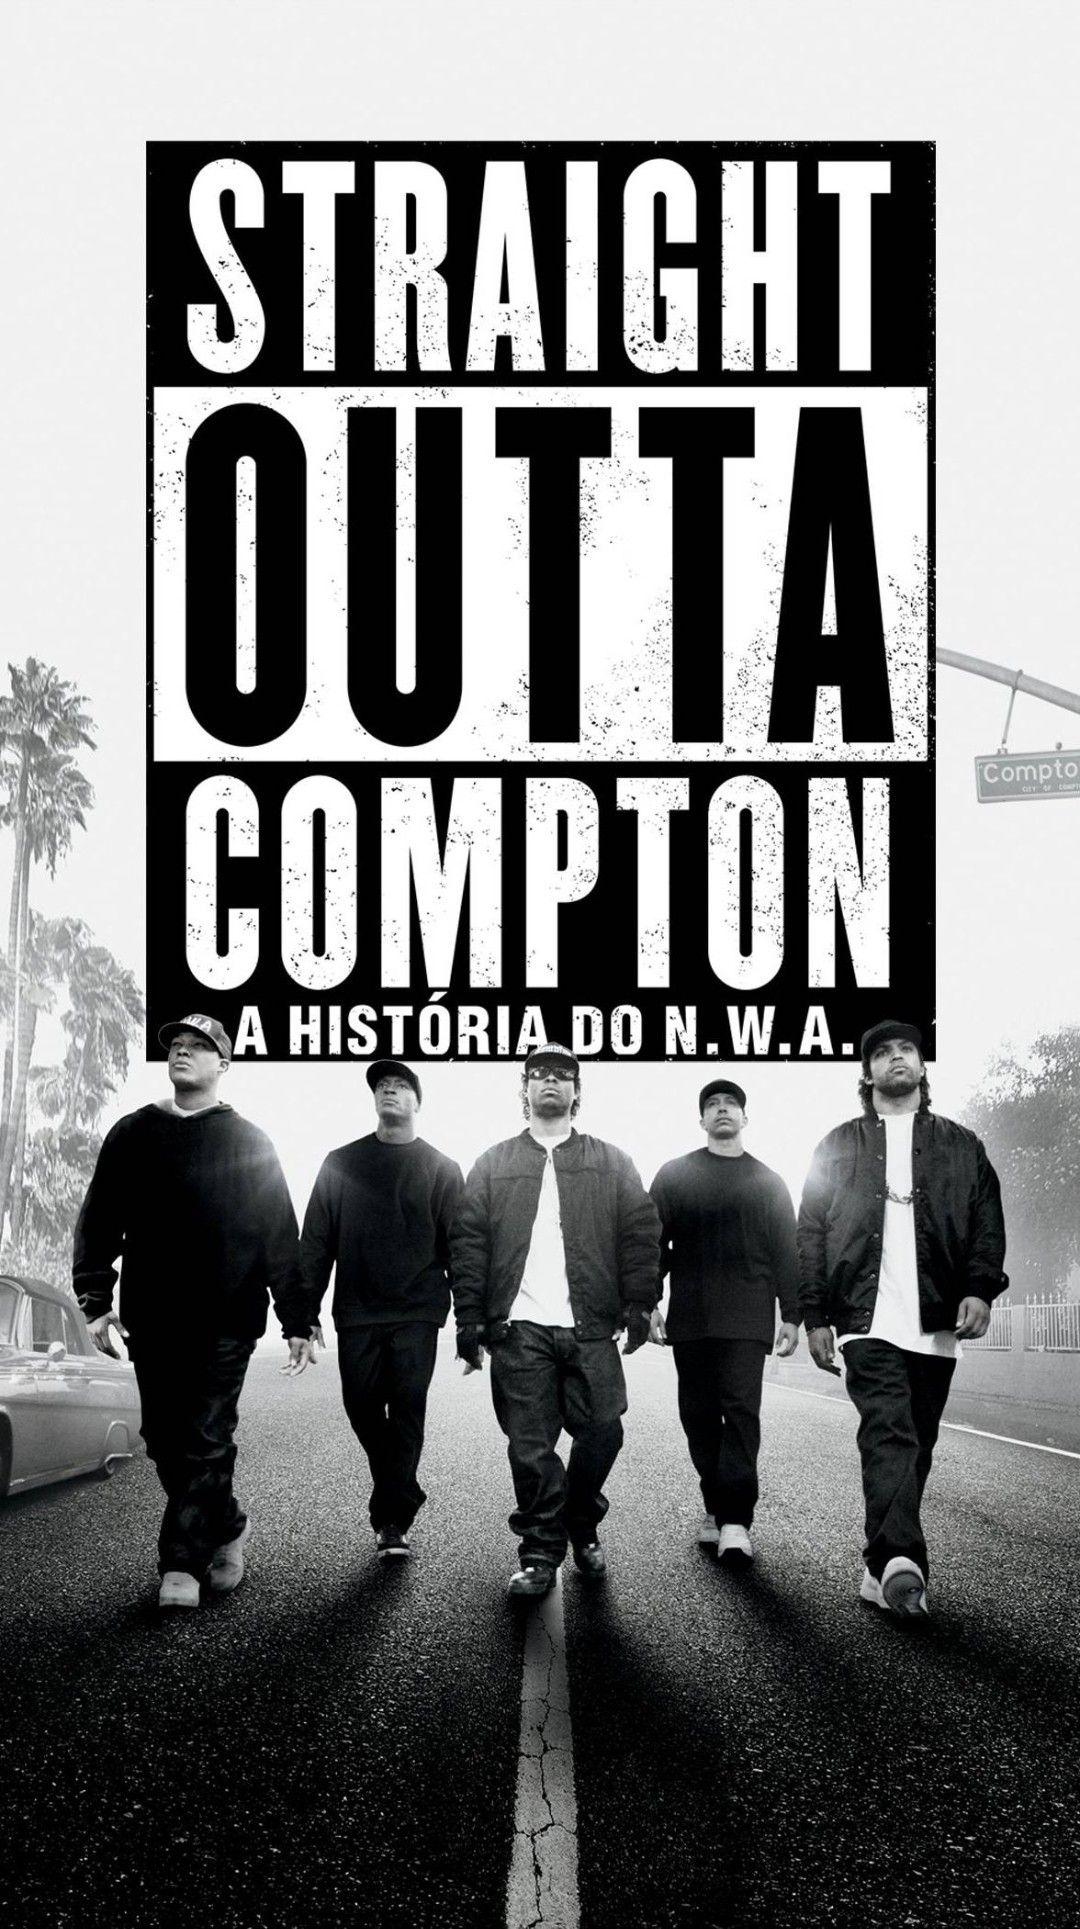 Pin By Numb Mamani On Fondod Guardados Straight Outta Compton Movie Outta Compton Straight Outta Compton Movie Poster